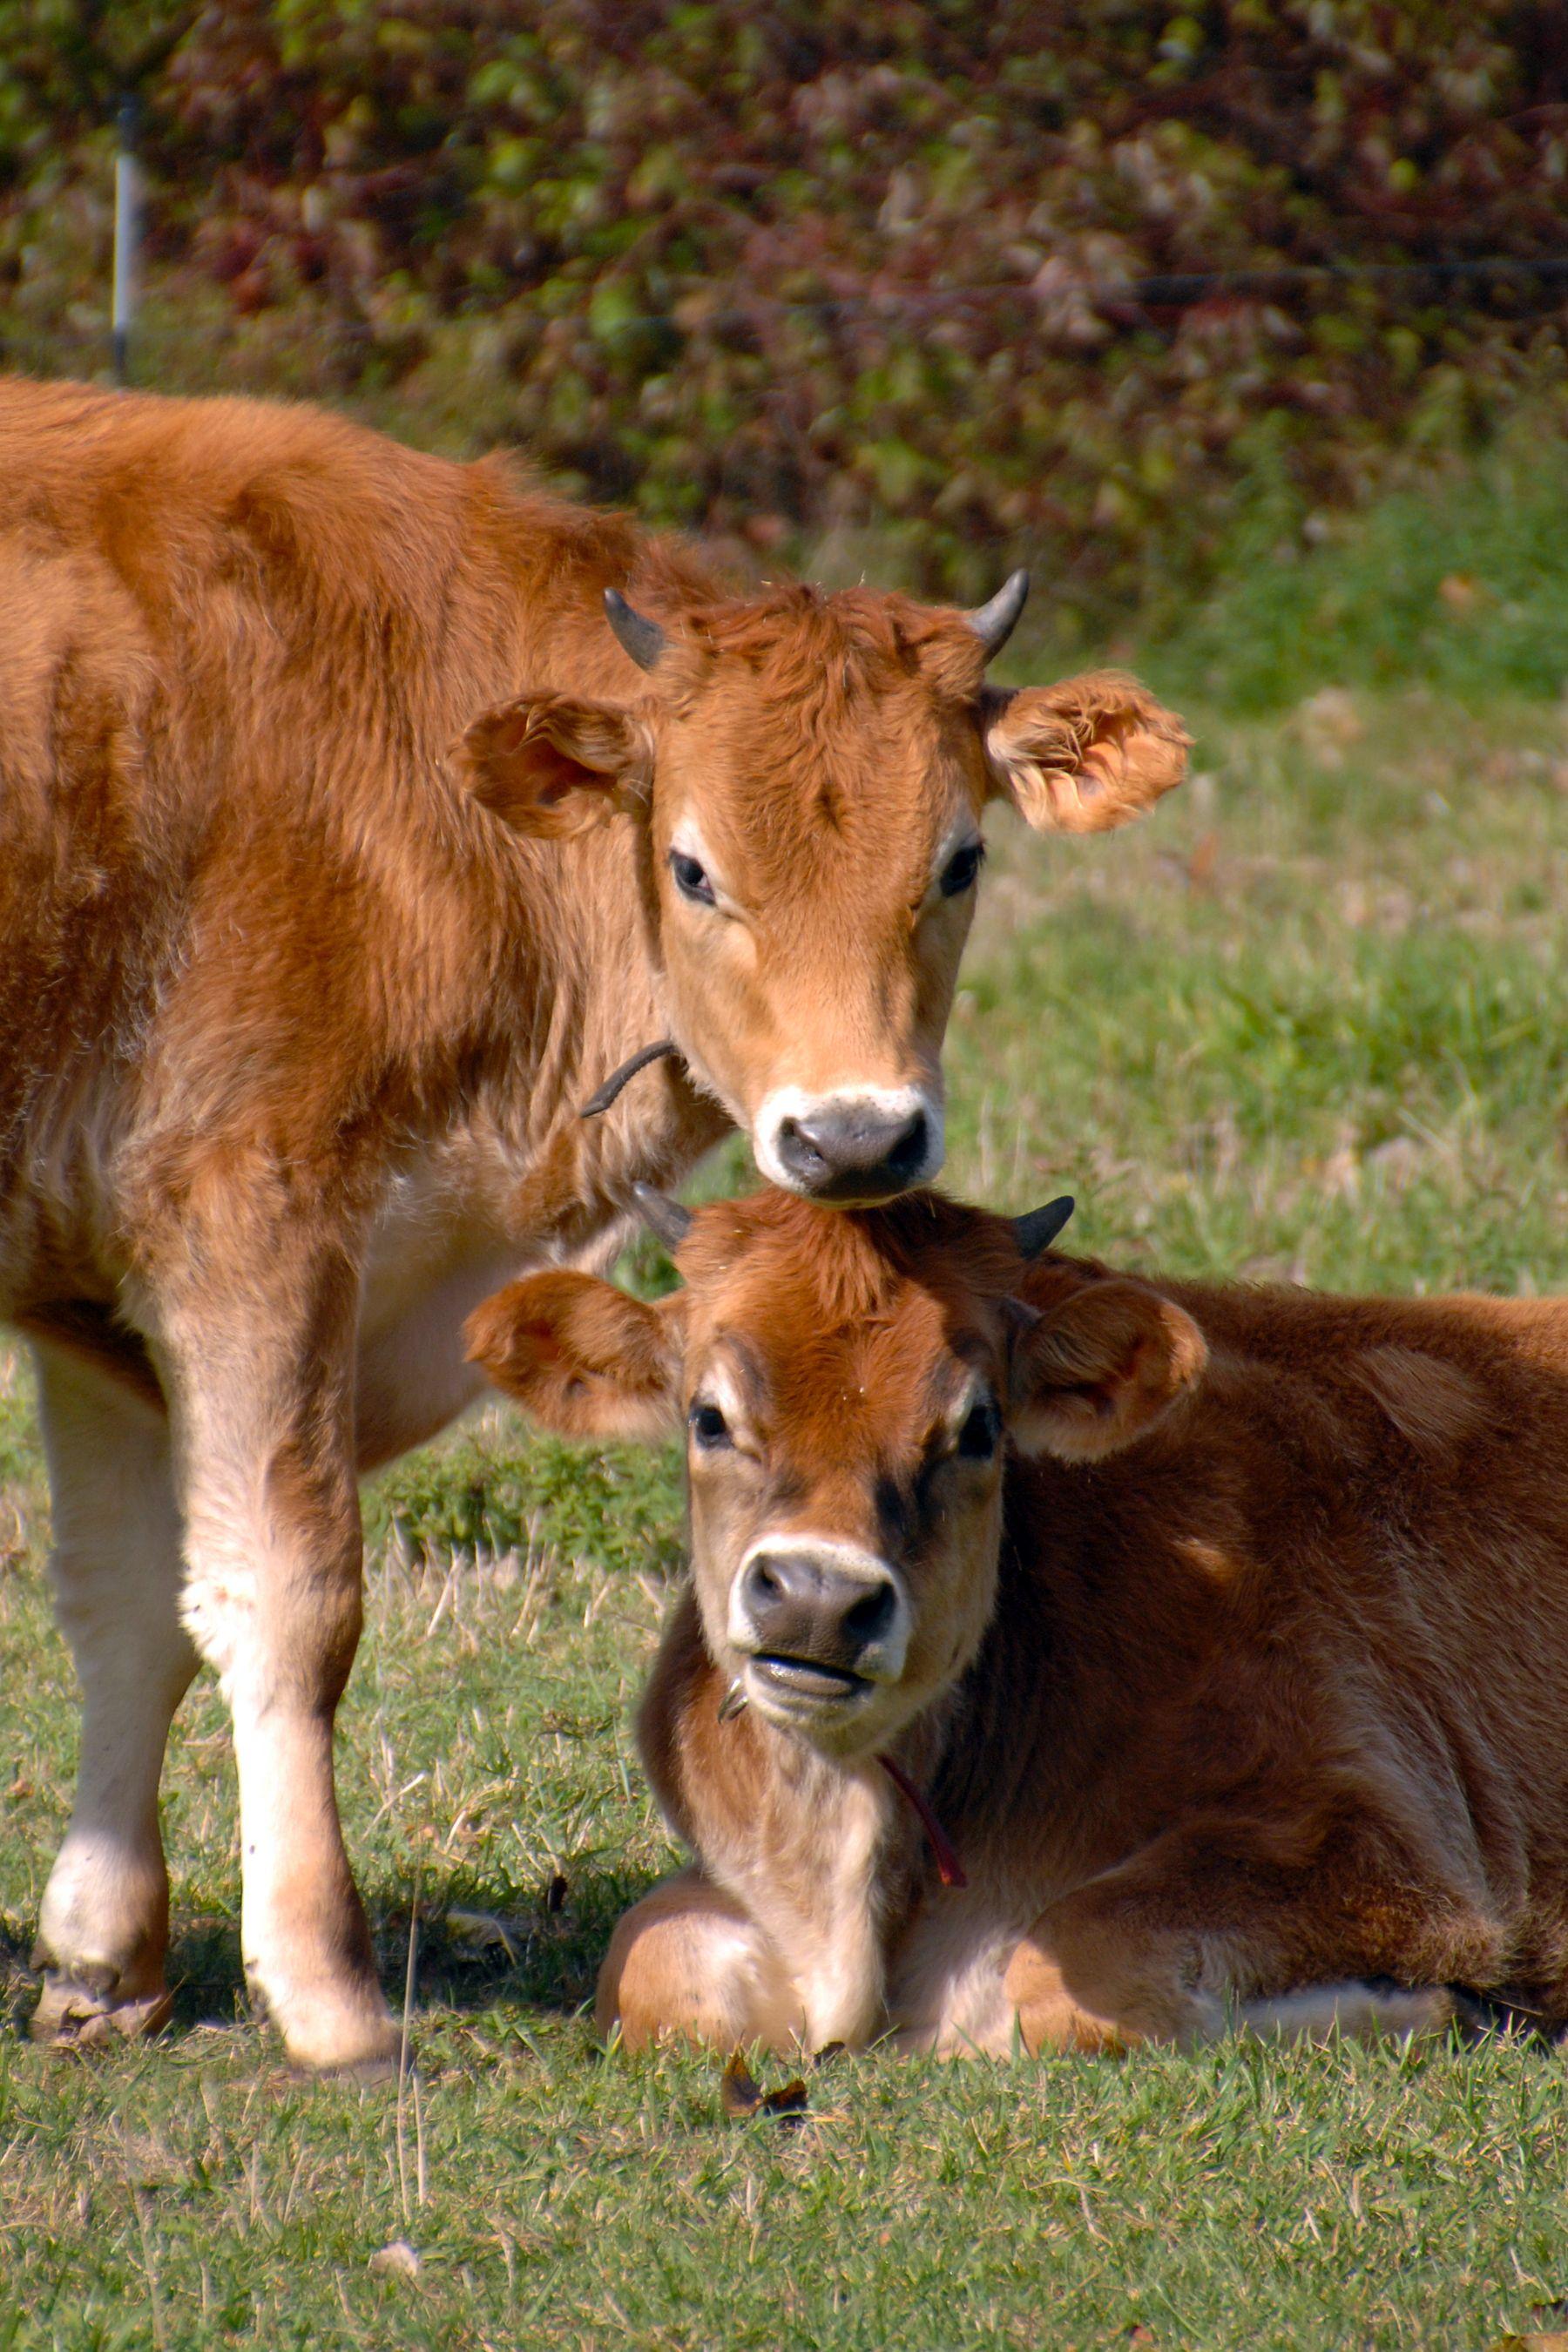 Photo by Mark Donnelly, Ph.D. #oxen #farmstead #farm #19thcentury ...